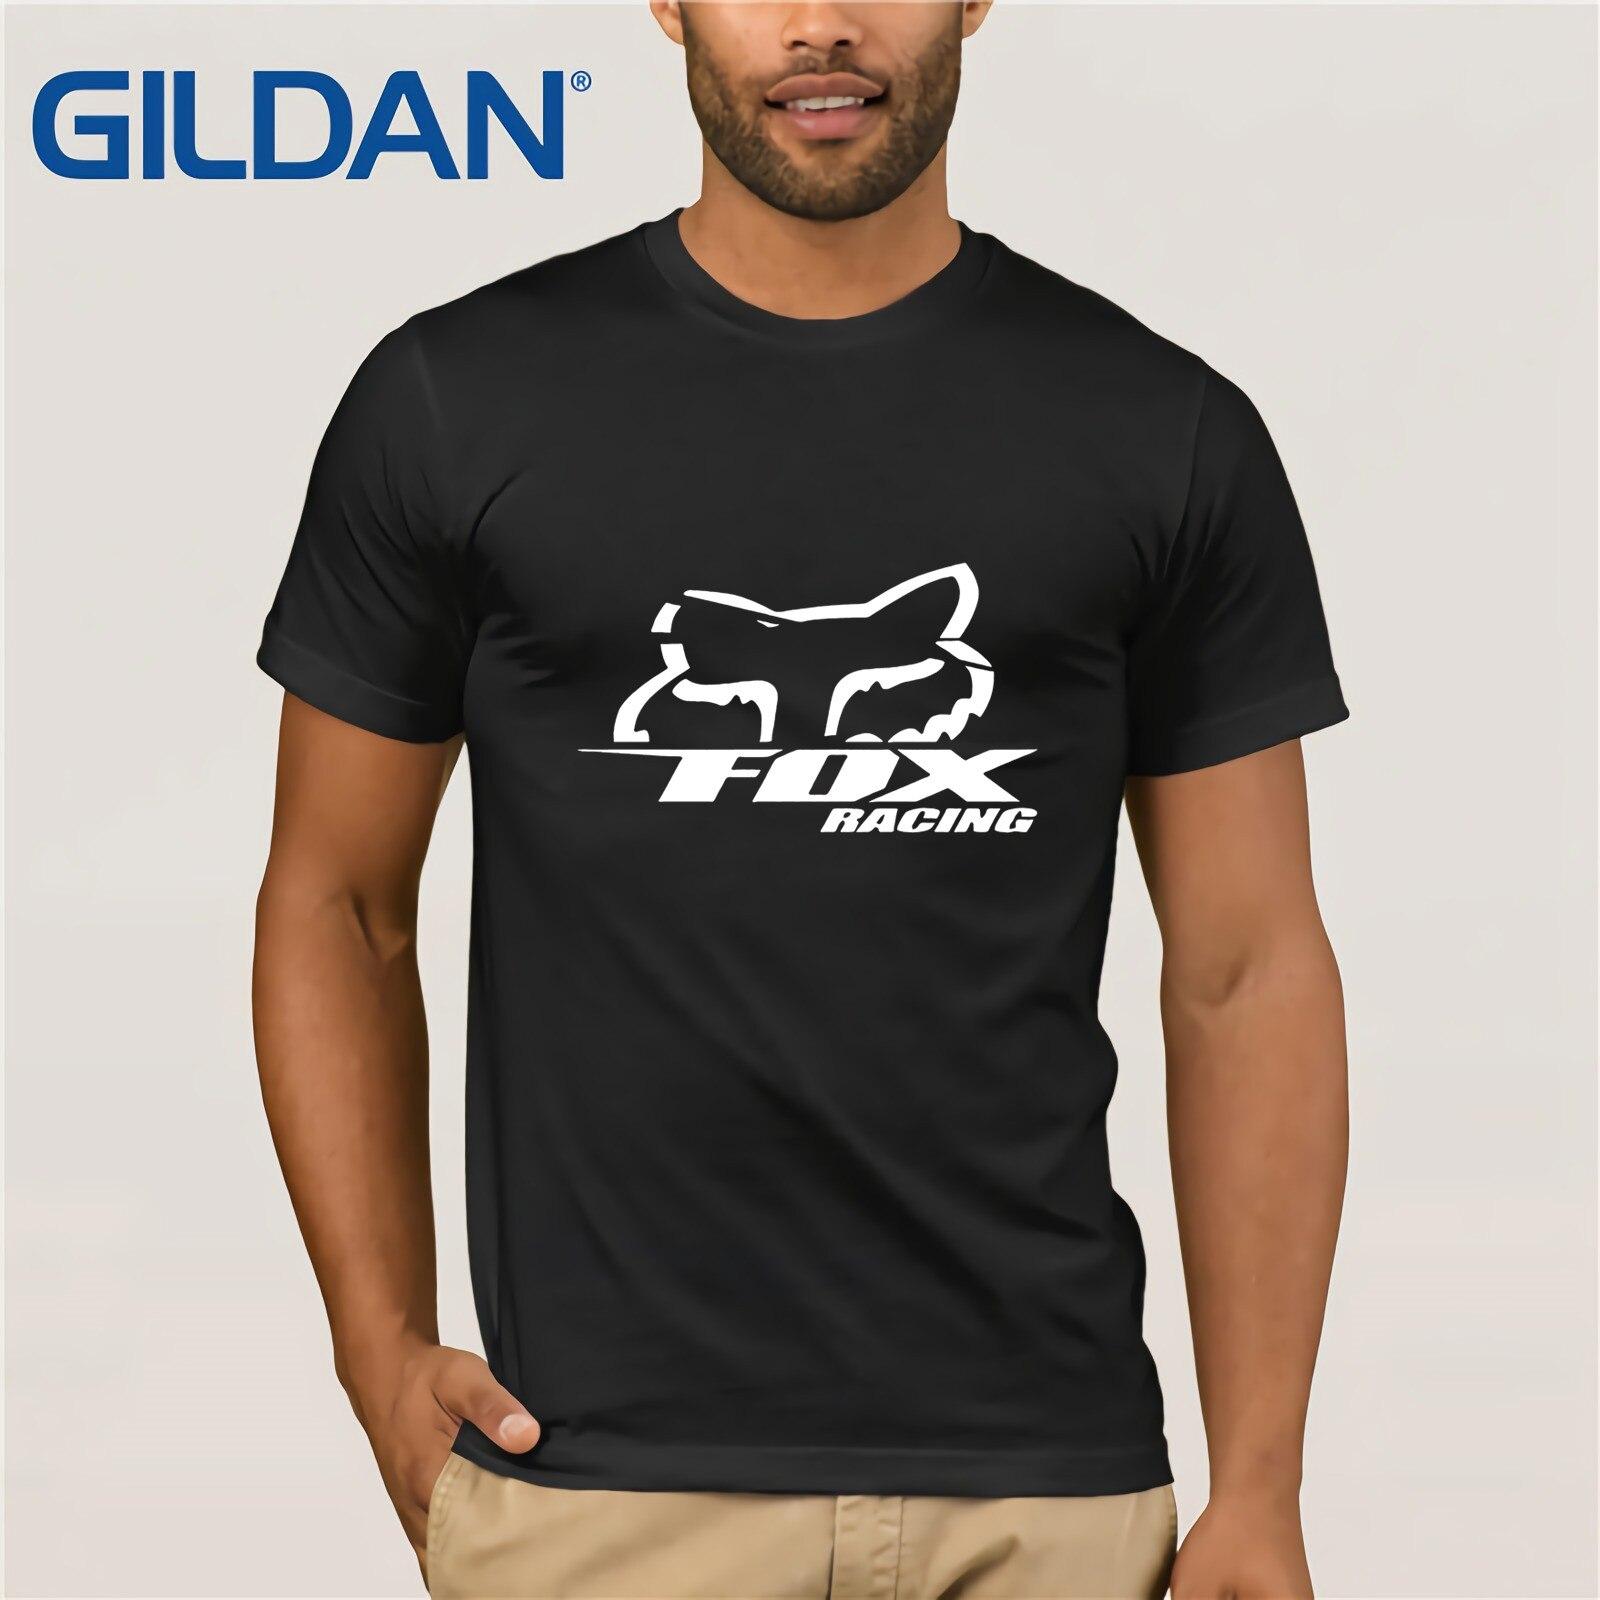 Fox Logo Racinger Black Men's T-Shirt Tee Clothes Popular T-Shirt Crewneck 100% Cotton Tees Funny Tees Cotton Tops T Shirt